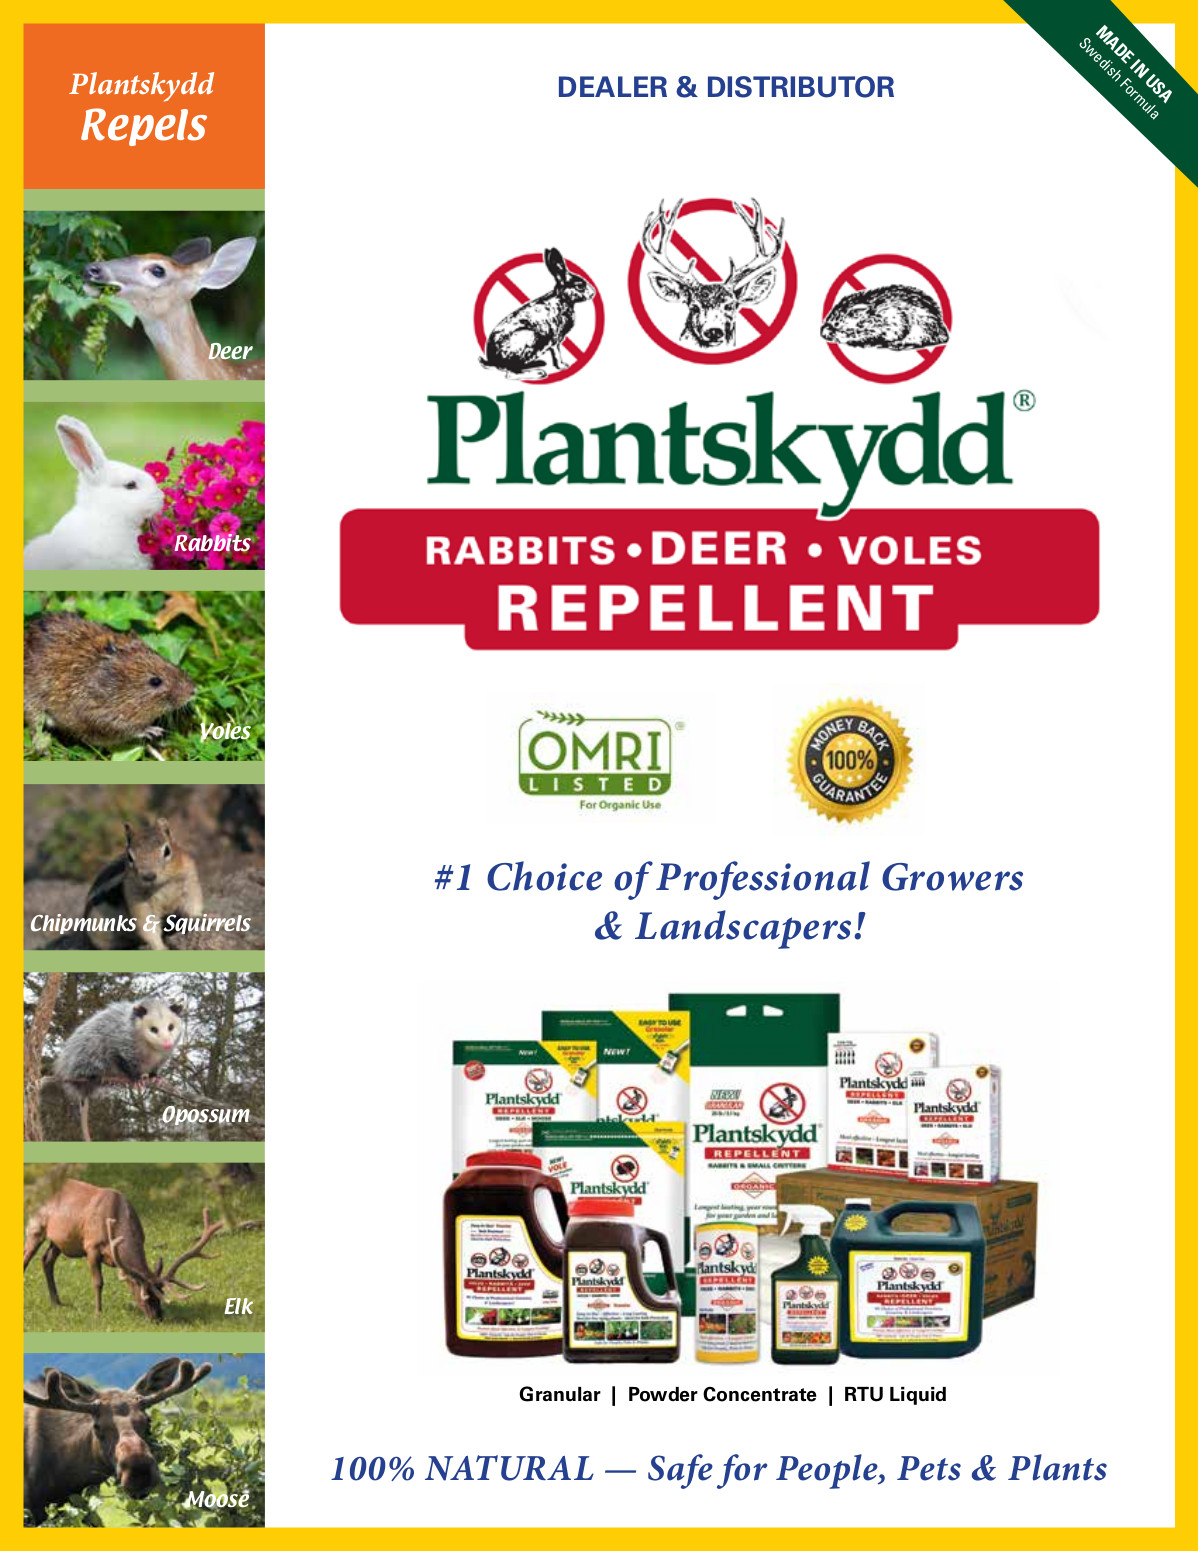 , Plantskydd, Redwood Nursery & Garden Center, Redwood Nursery & Garden Center